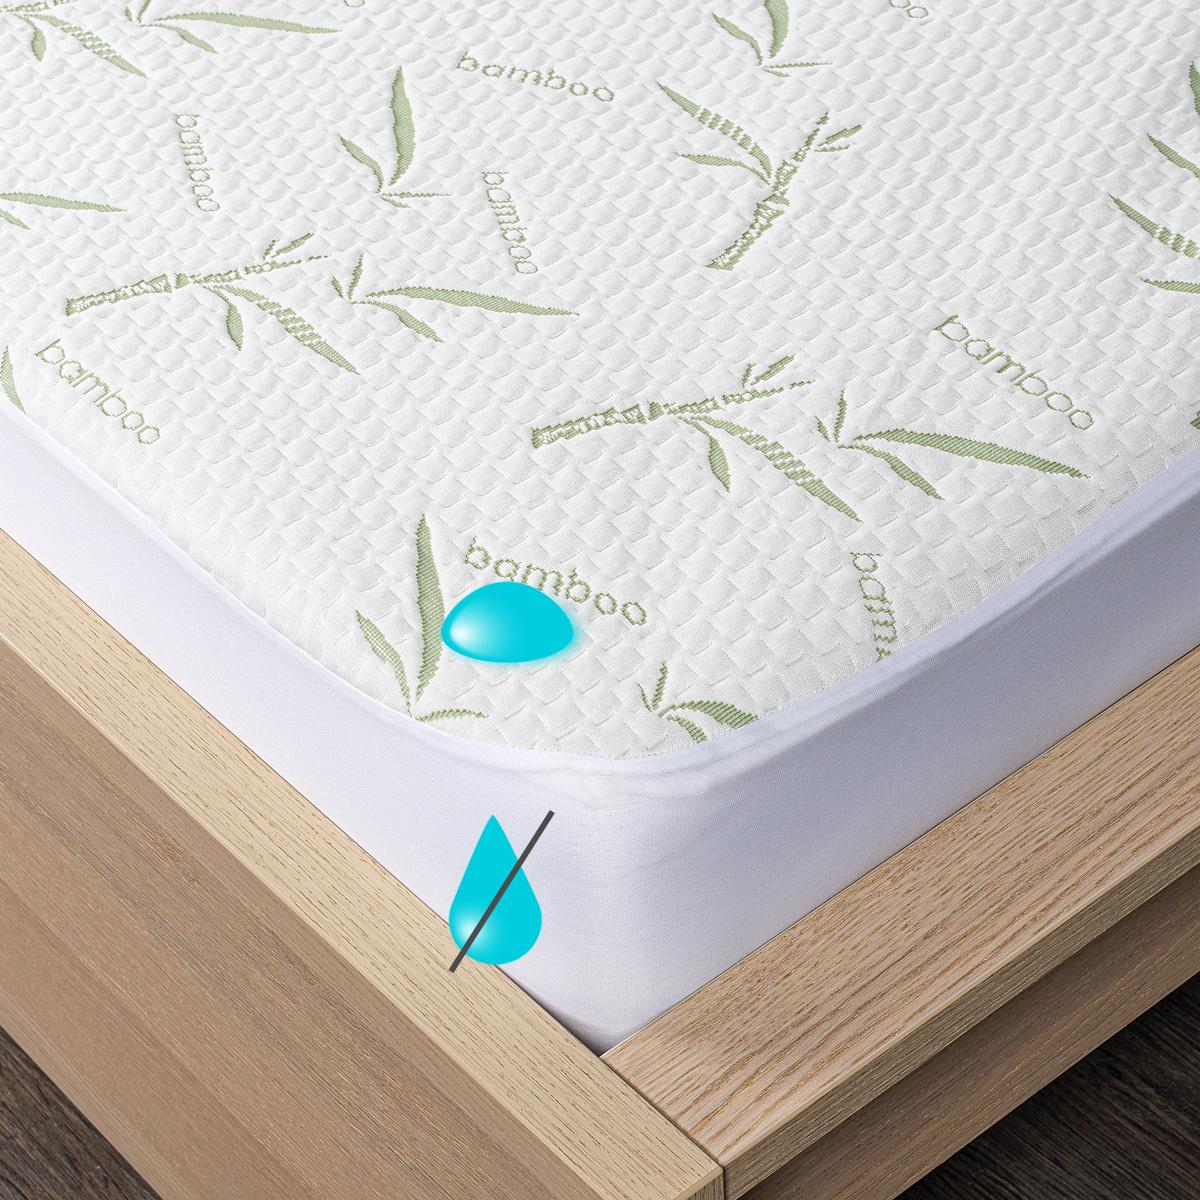 4Home Bamboo Nepropustný chránič matrace s lemem, 70 x 160 cm